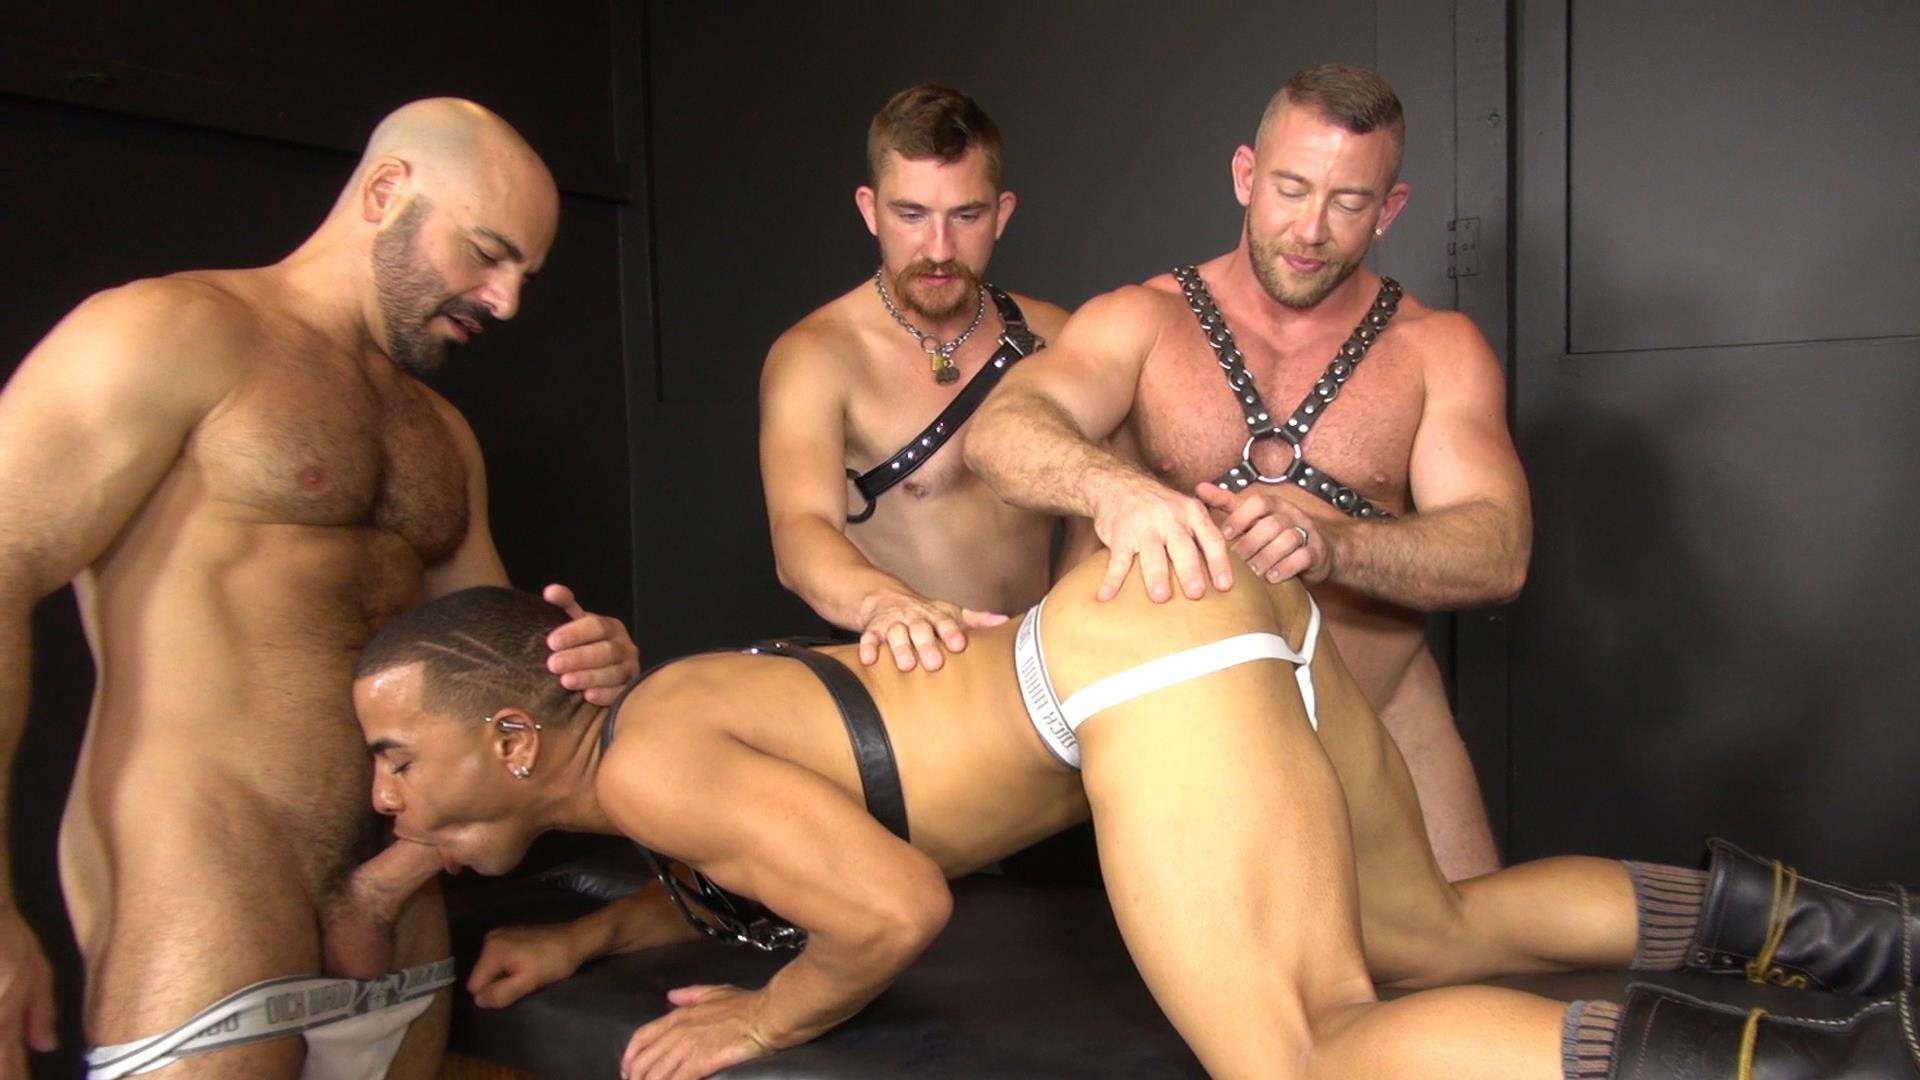 Raw-and-Rough-Ken-Byker-Dayton-OConnor-Trelino-Shay-Michaels-Adam-Russo-Cutler-X-Interracial-Bareback-Orgy-Amateur-Gay-Porn-01 Interracial Bareback Orgy With Adam Russo & Cutler X